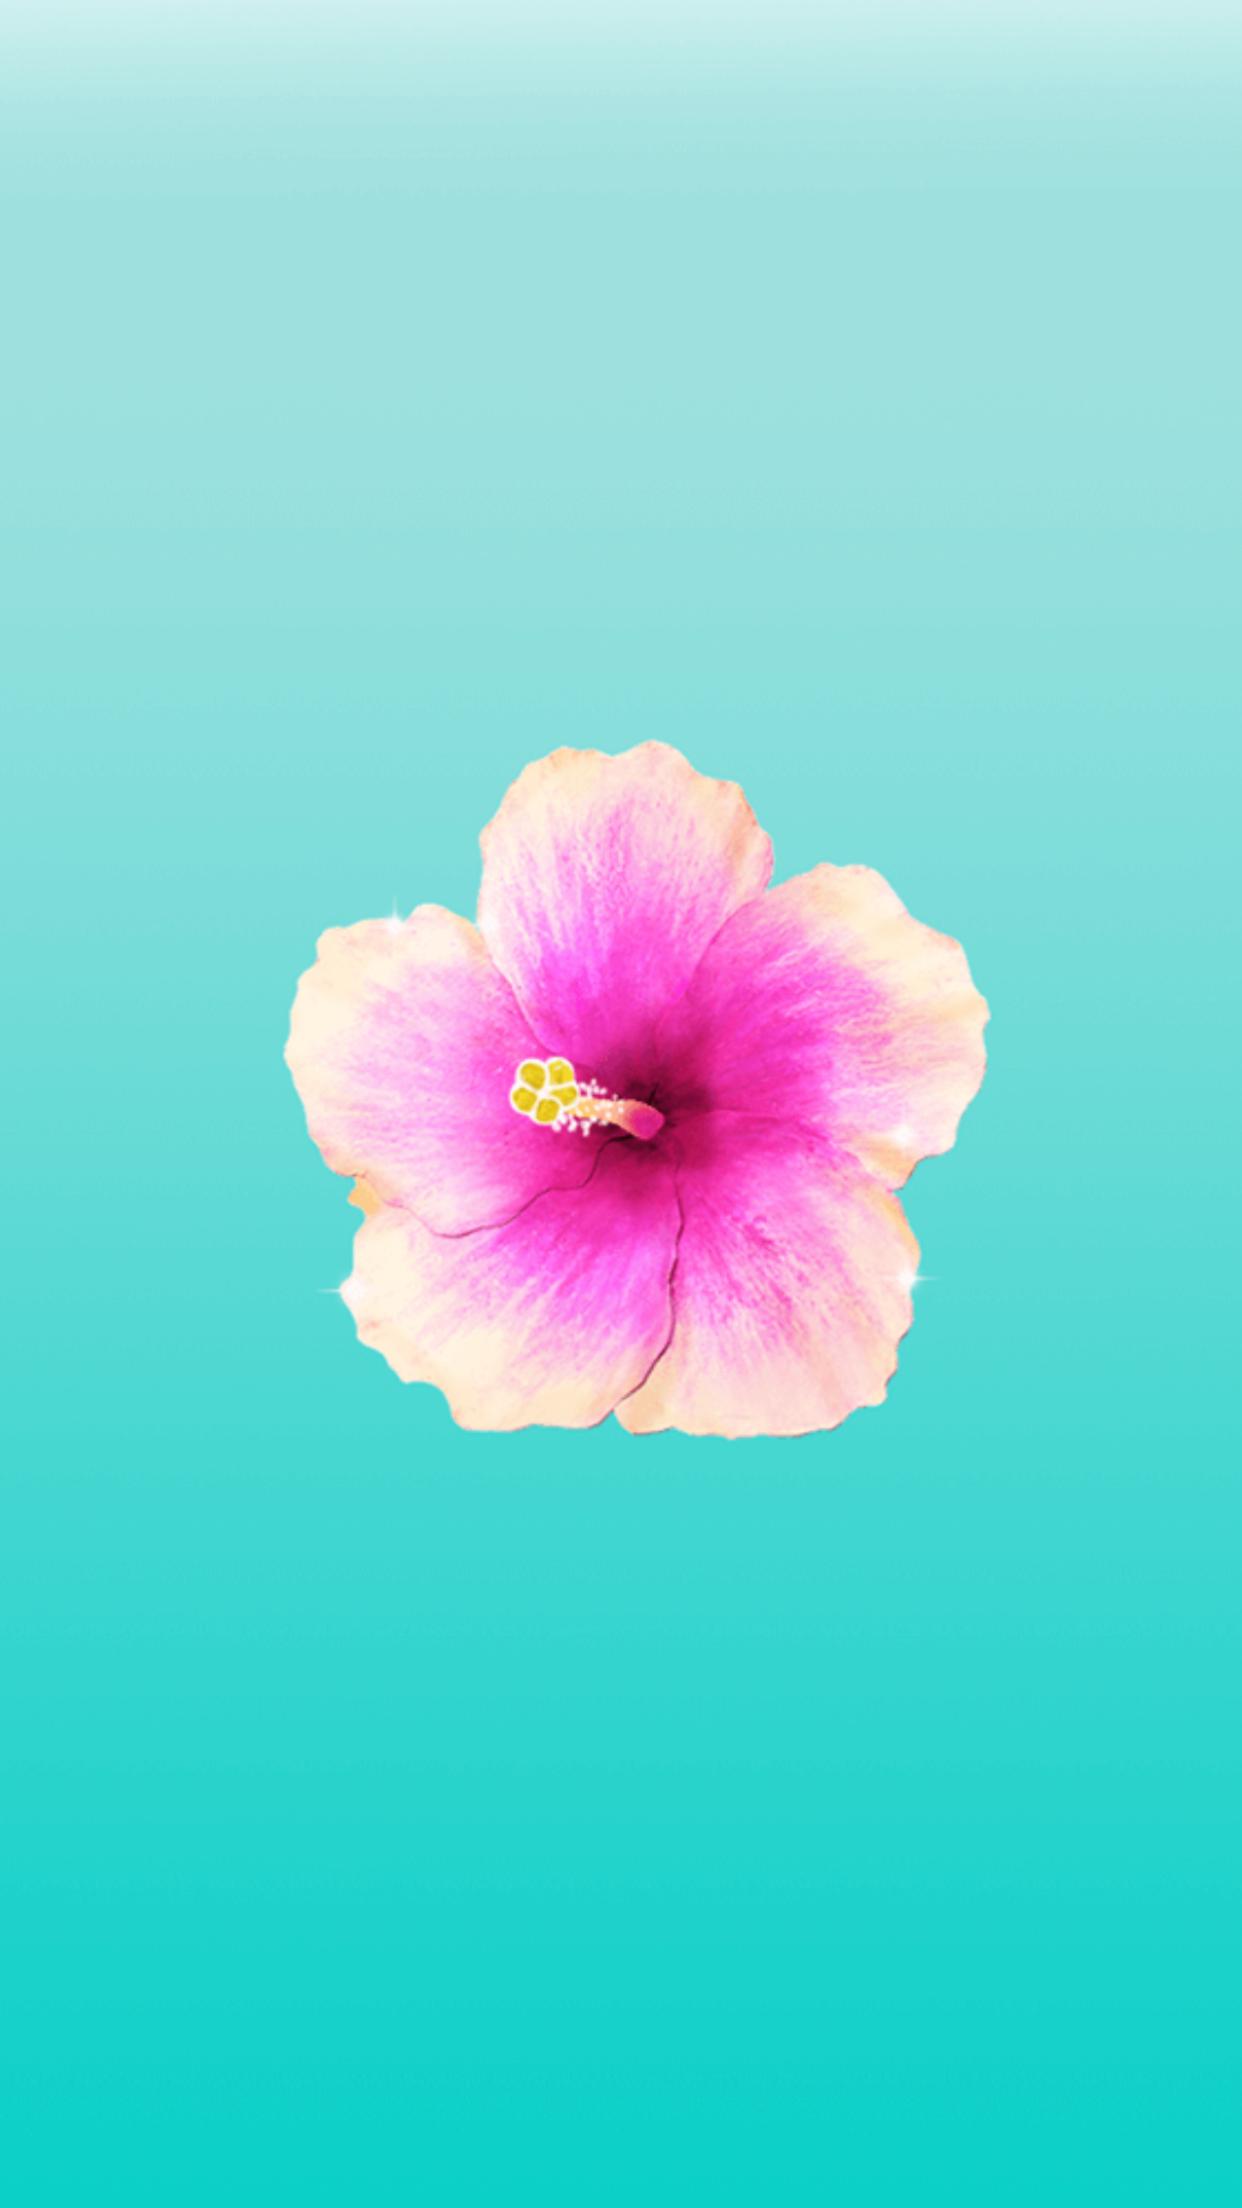 mint background pink flower iphone wallpaper pinterest